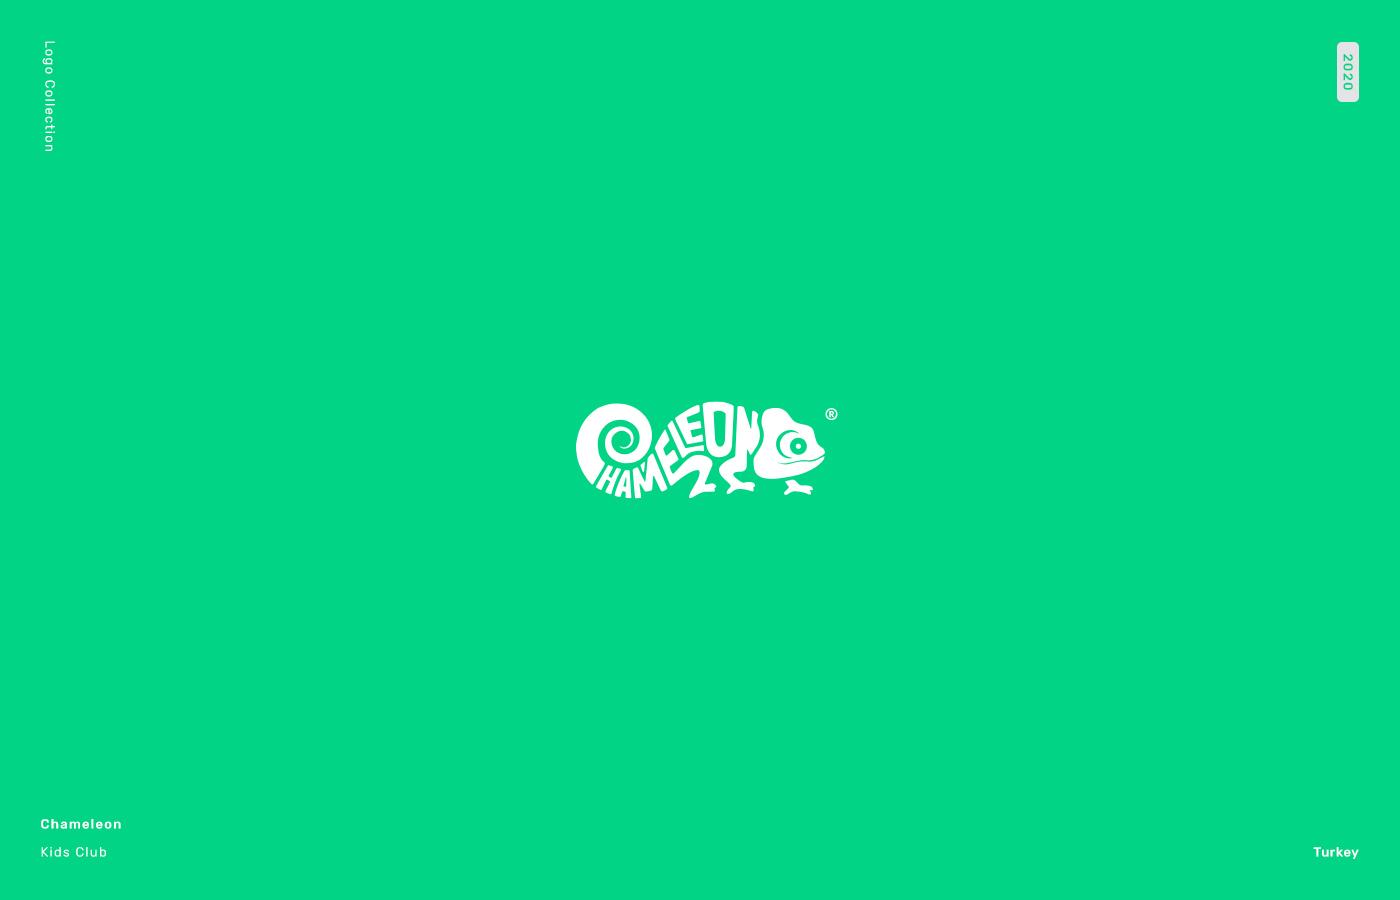 noyan-ozun-logo-chameleon